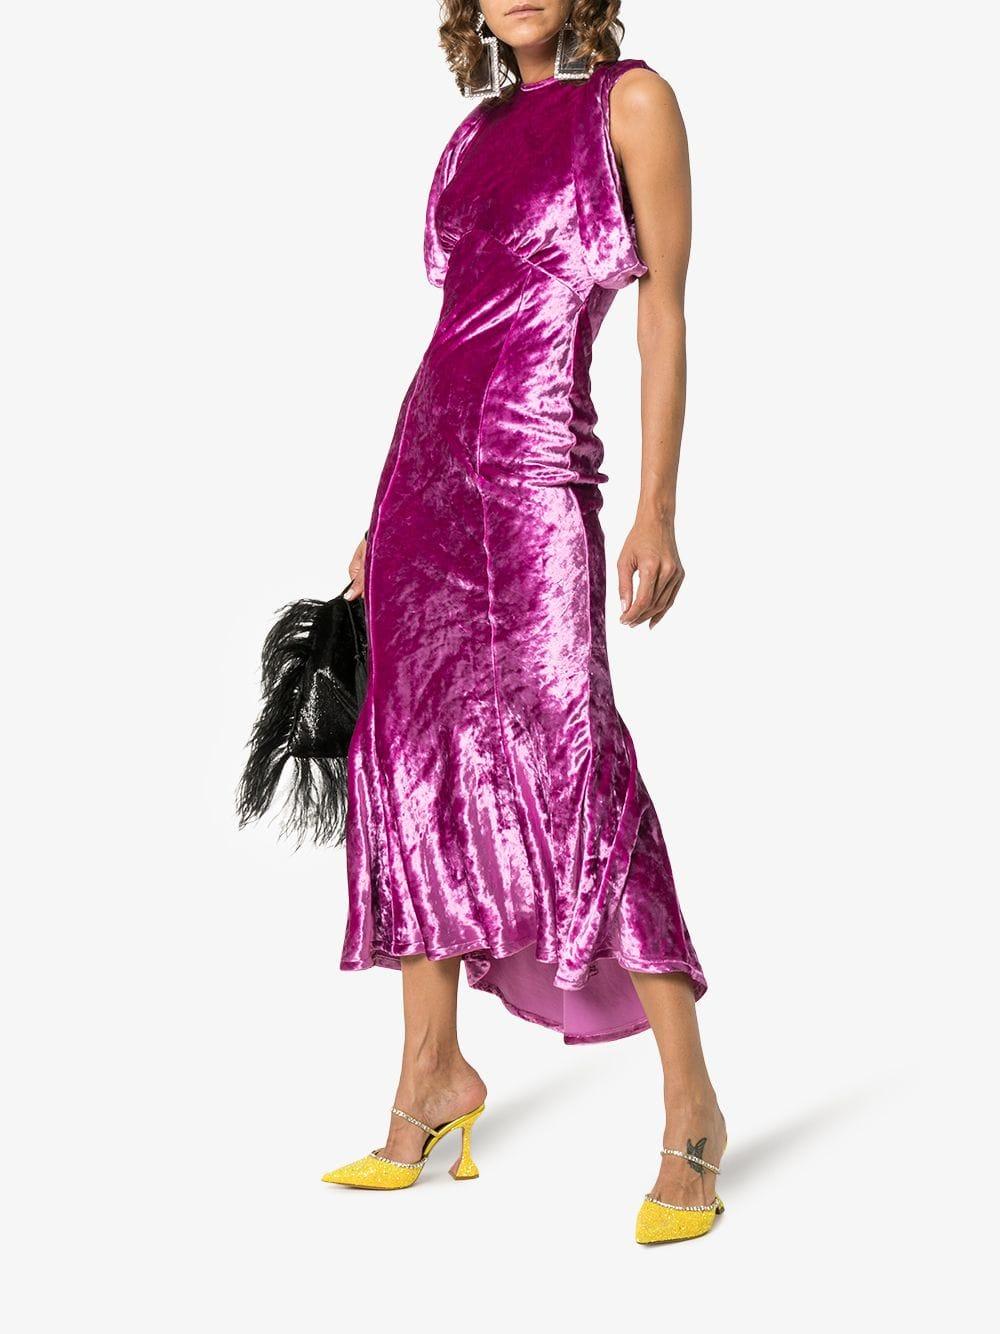 pink velvet sleveless dress with round neck ATTICO |  | ATW18523033